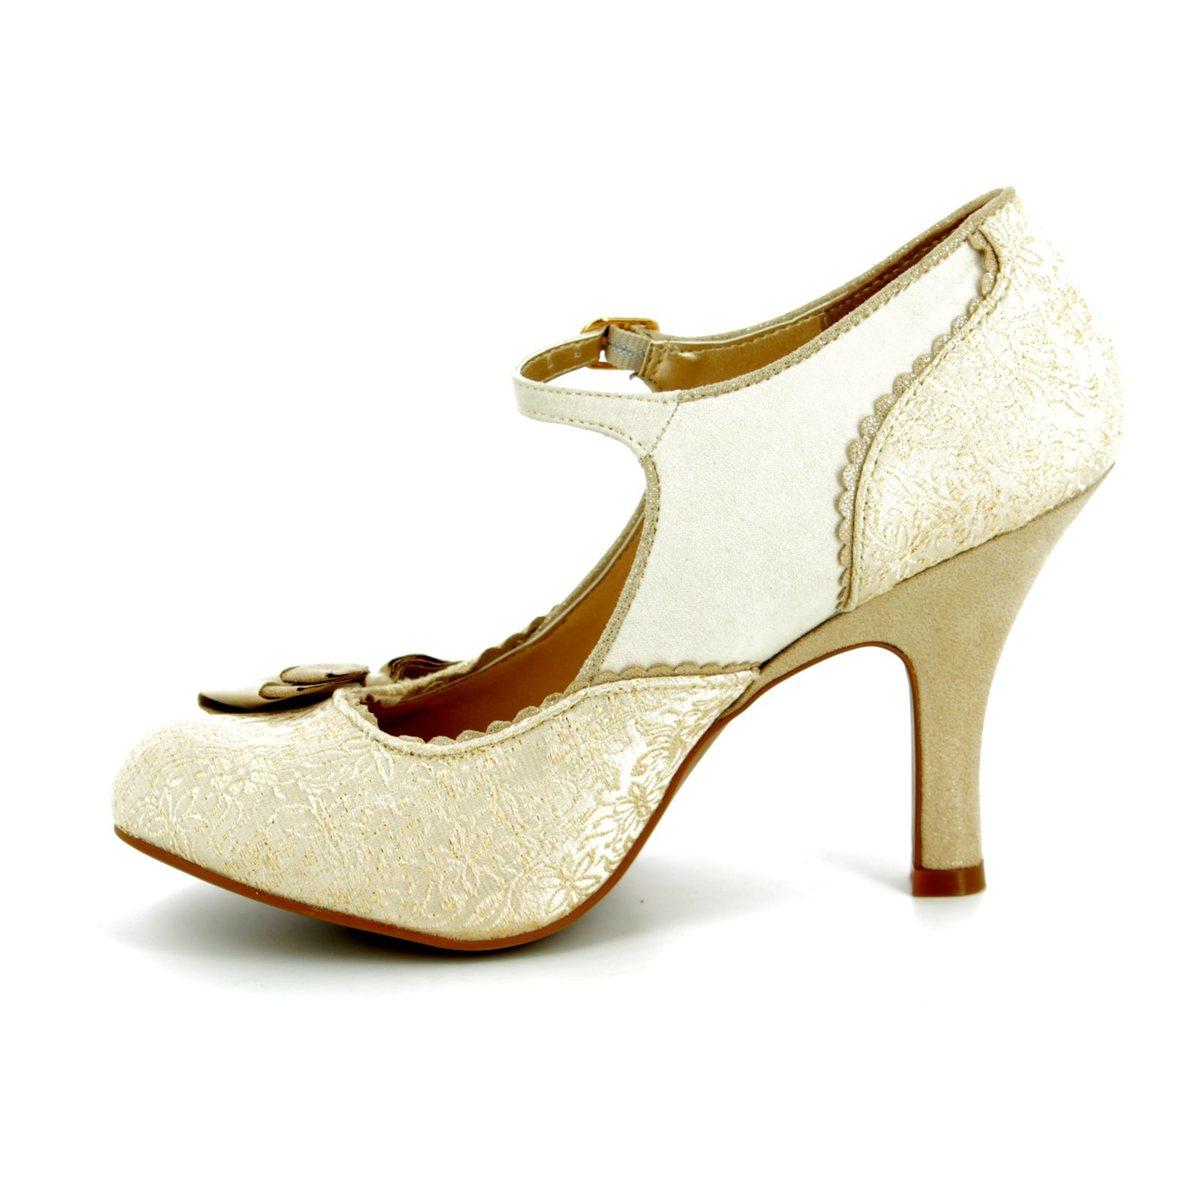 d69125d4aa313 Ruby Shoo High-heeled Shoes - Cream - 09155/75 MARIA